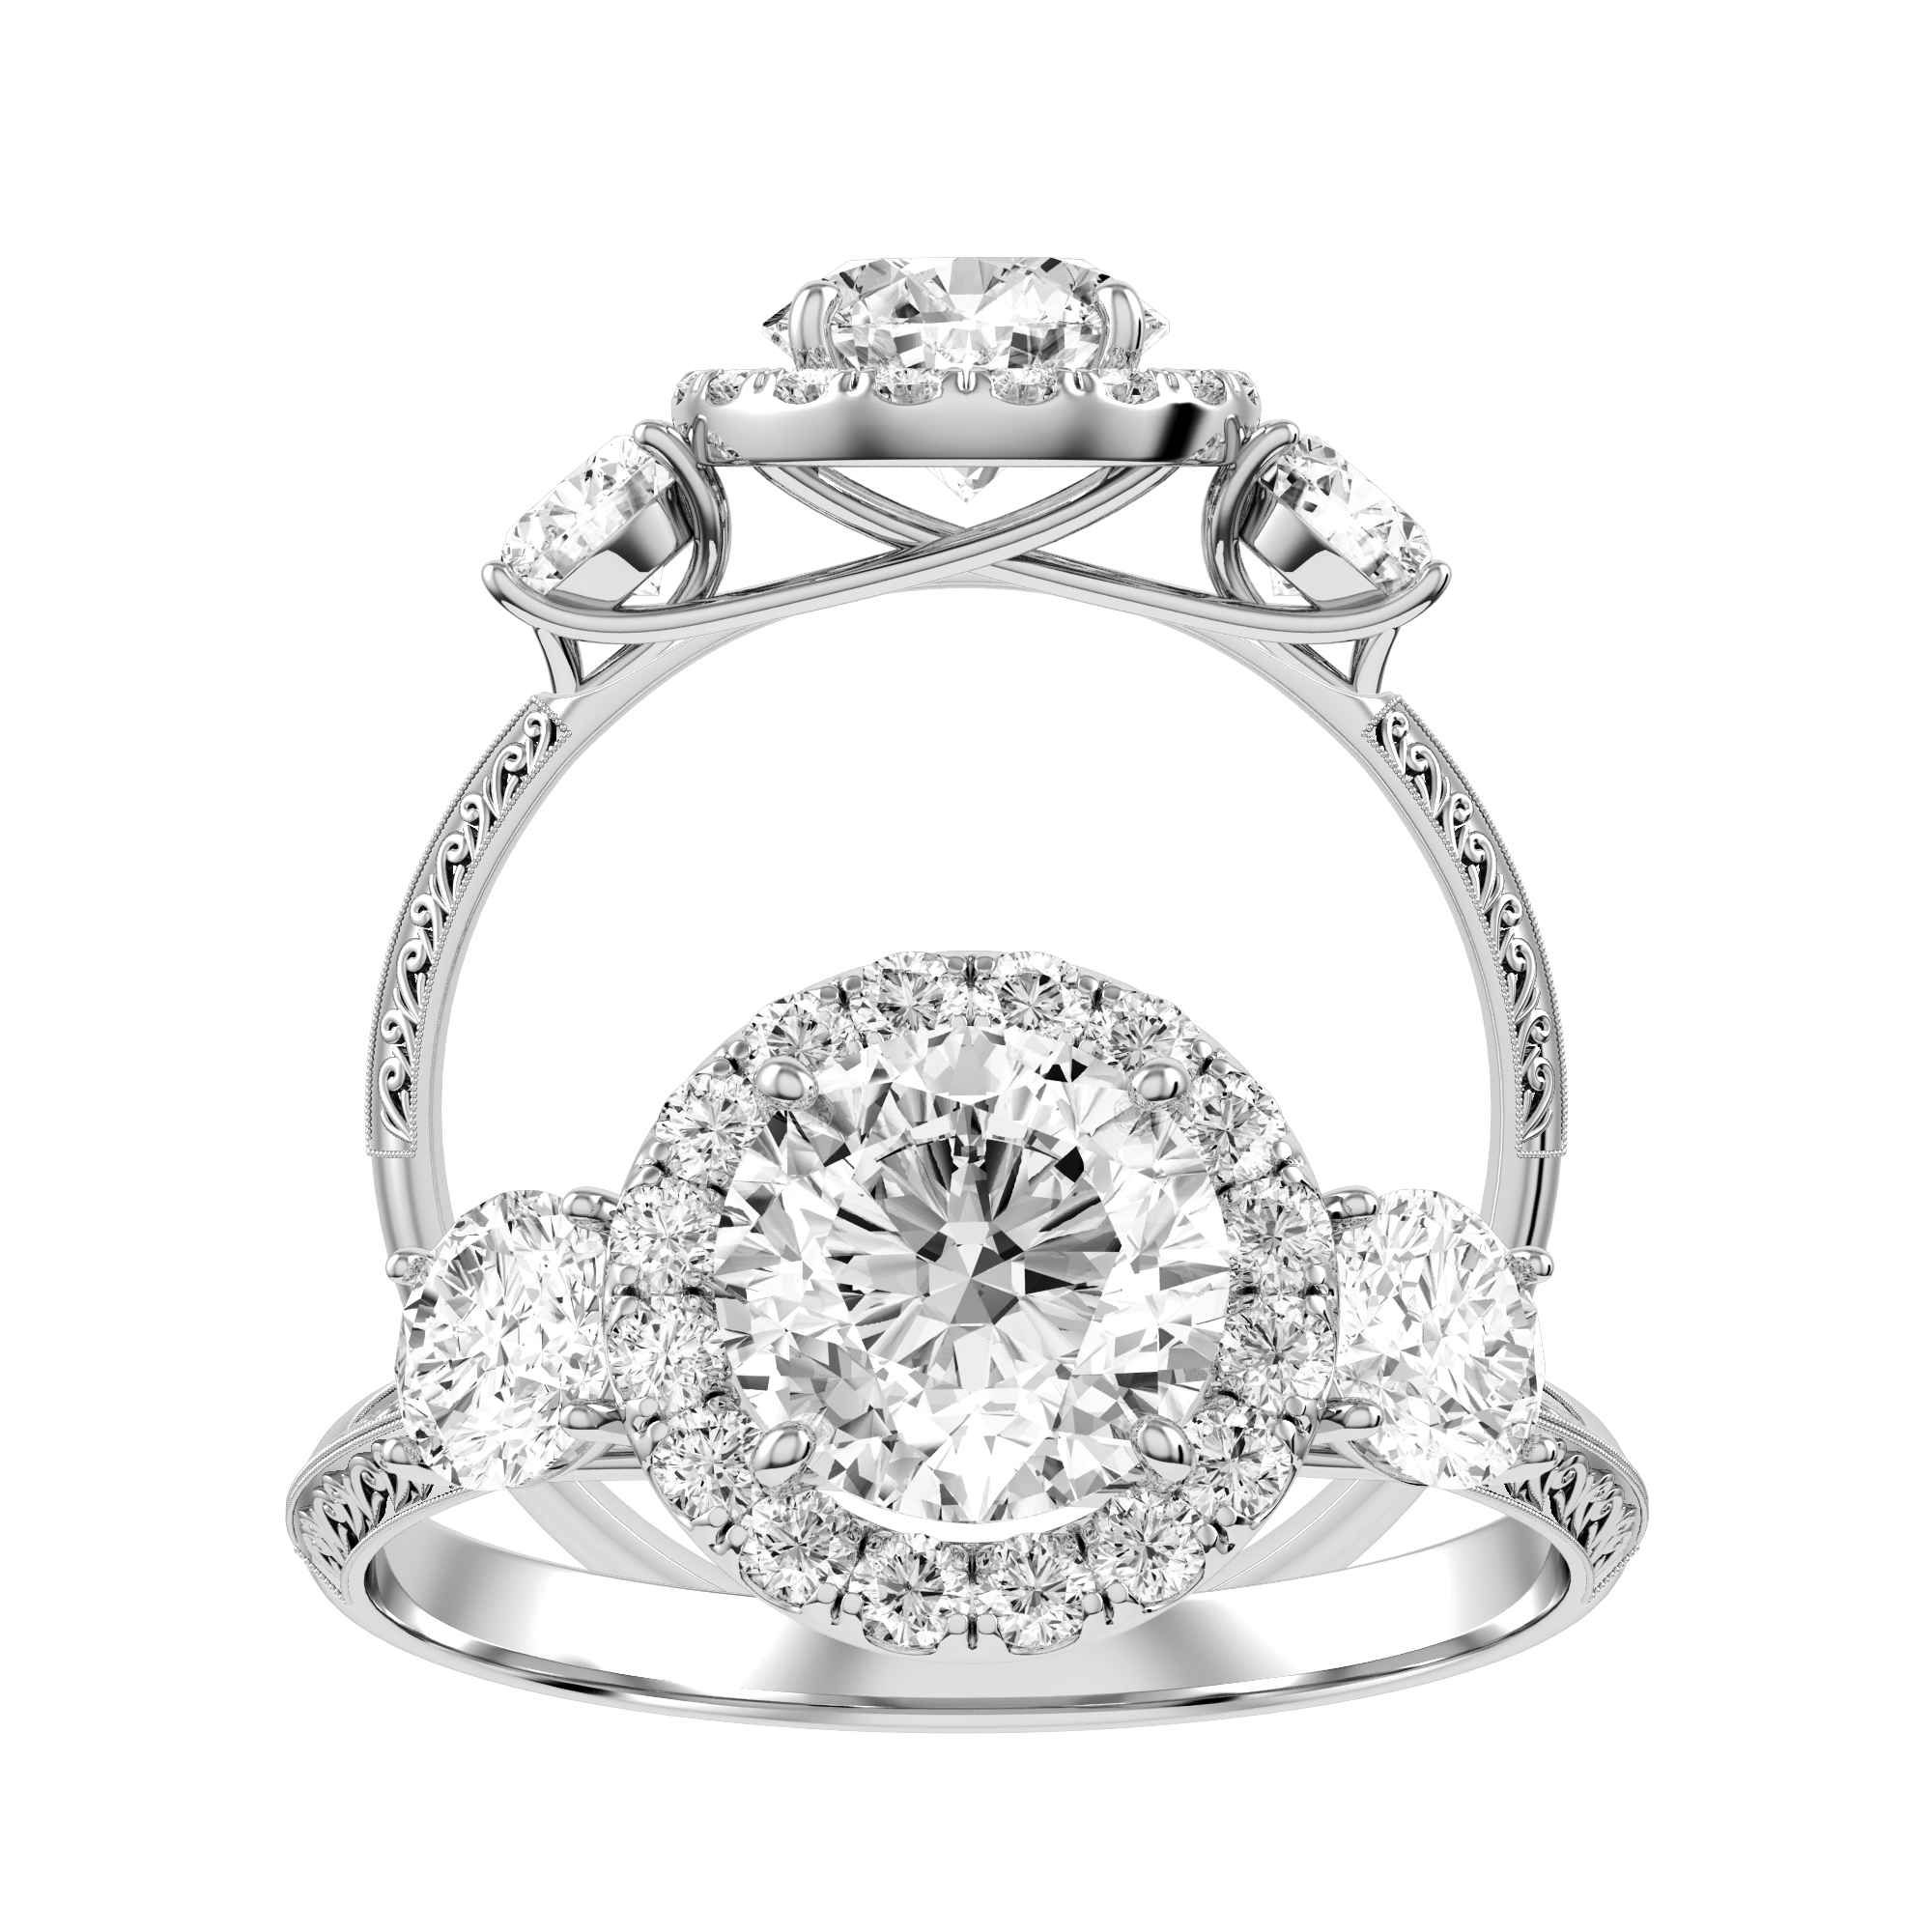 Zales The Diamond Store Wedding, Engagement Rings